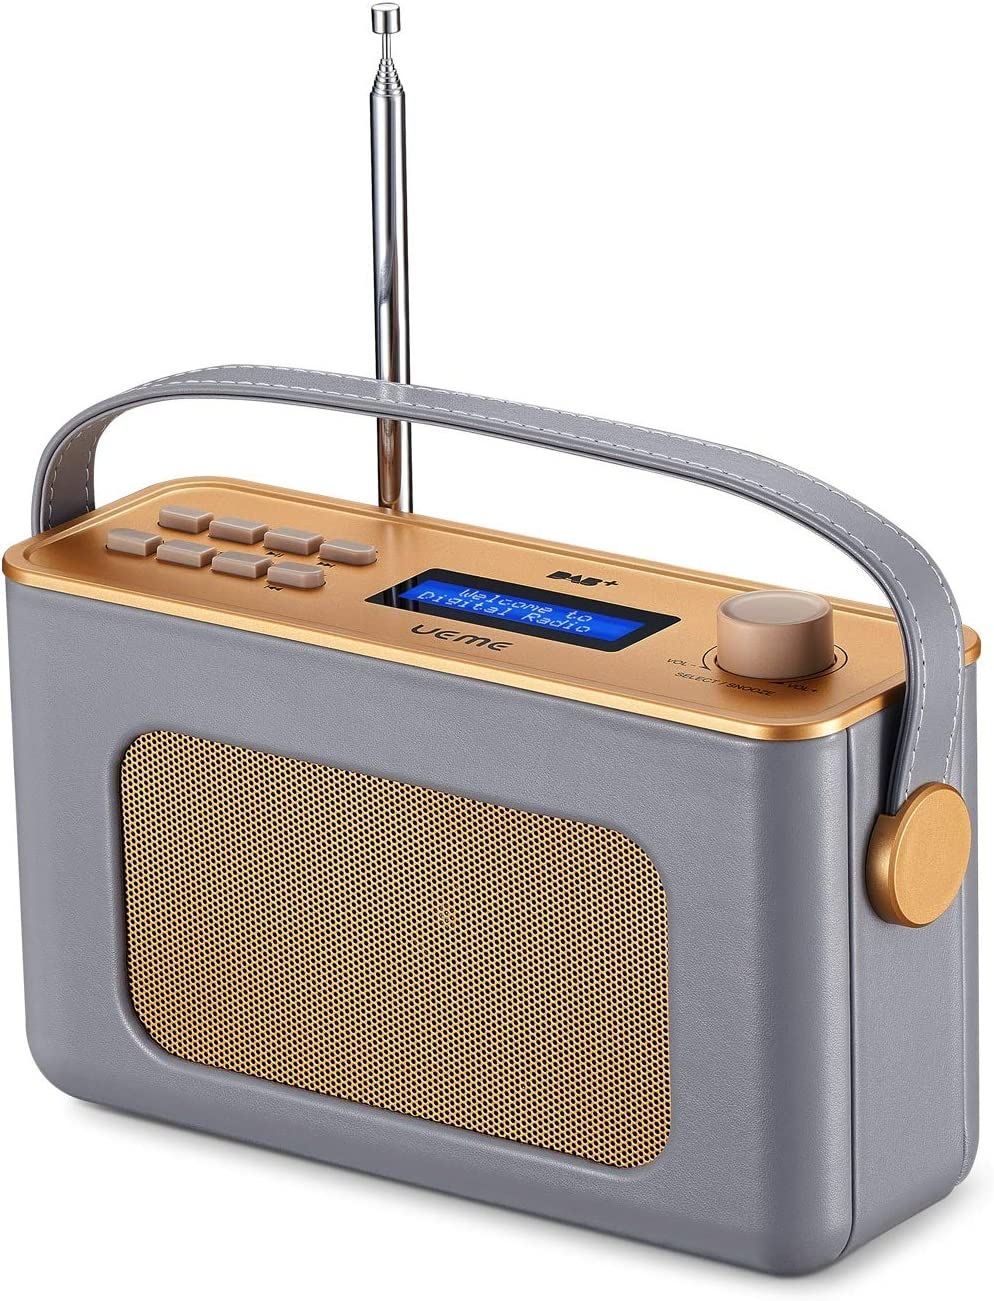 Ueme Retro Digitalradio Mit Bluetooth Dab Dab Ukw Elektronik